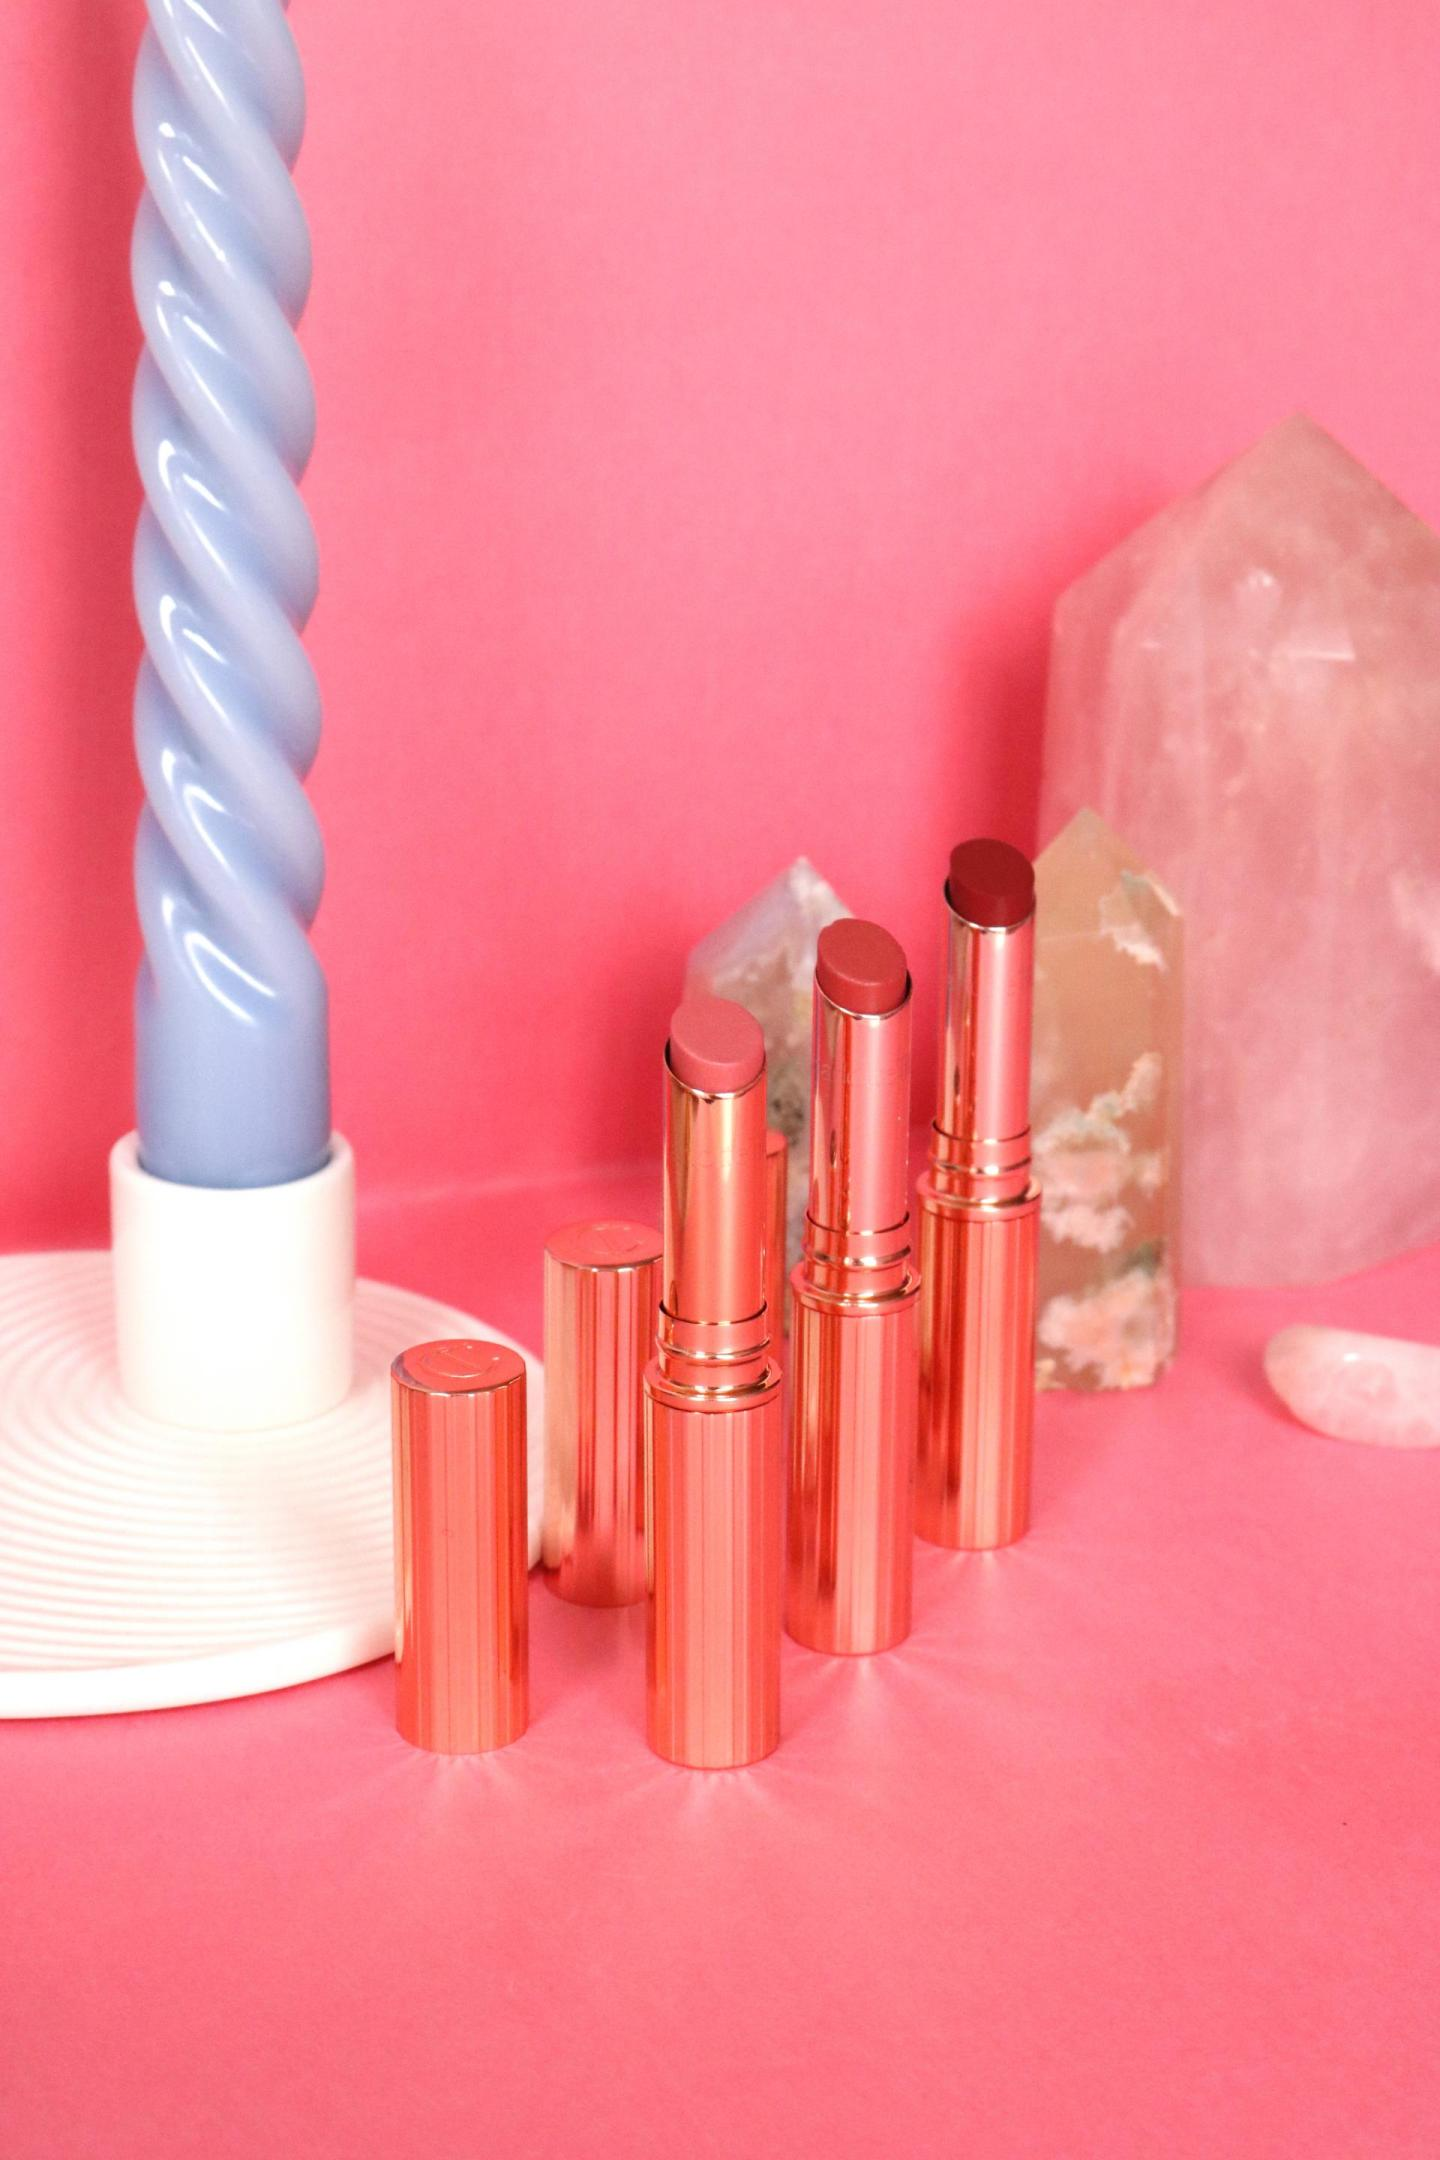 Charlotte Tilbury Superstar Lips Lippenstift